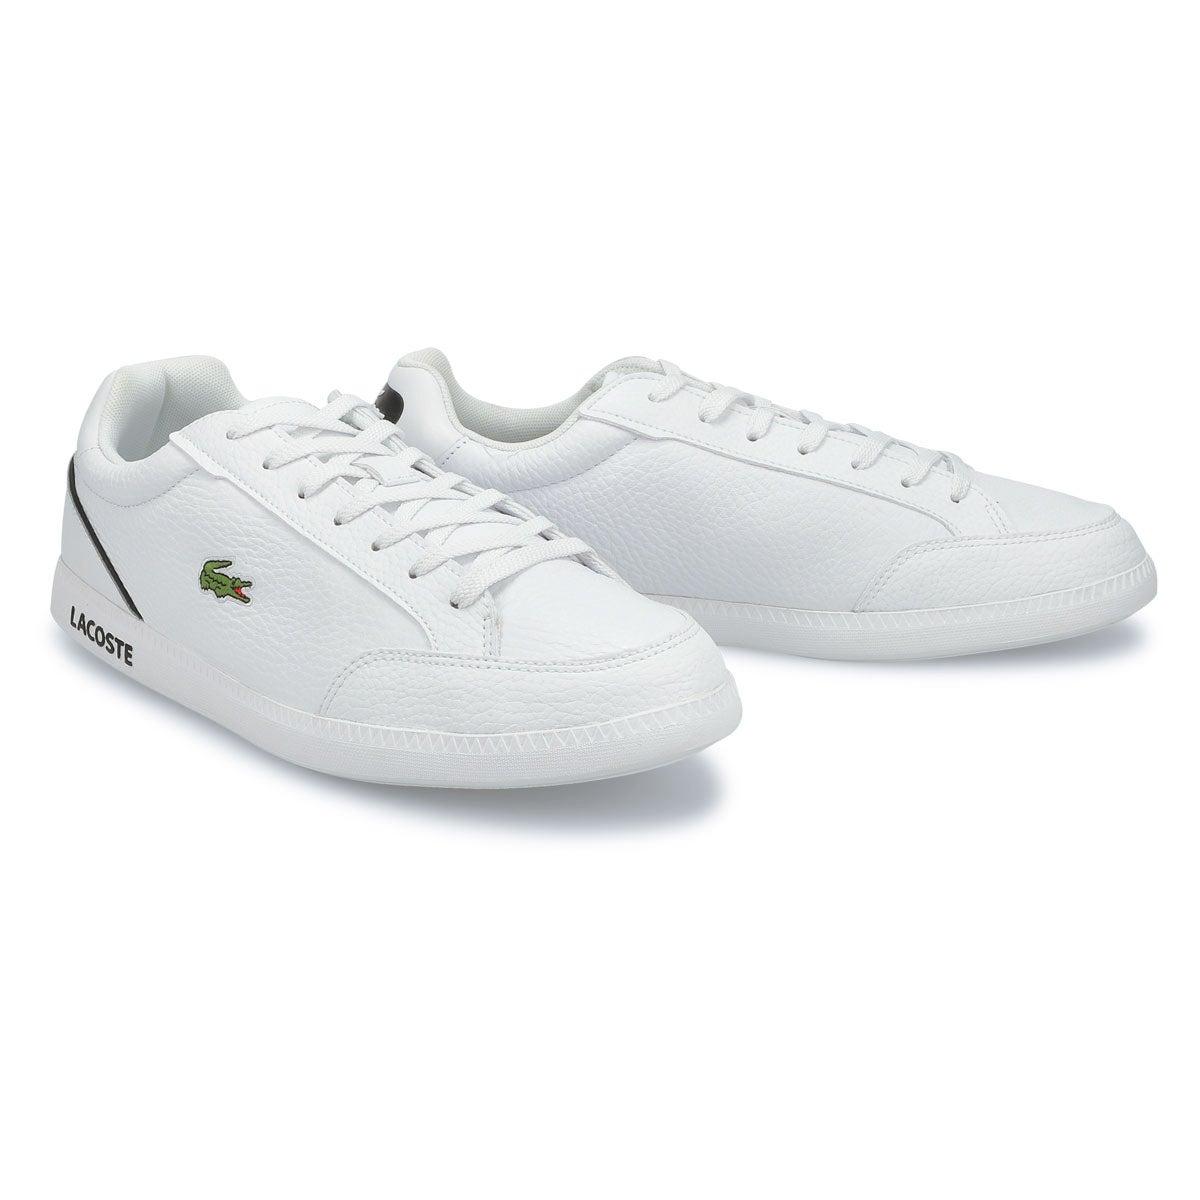 Men's Graduate Cap 0721 1 Sneaker -White/Black